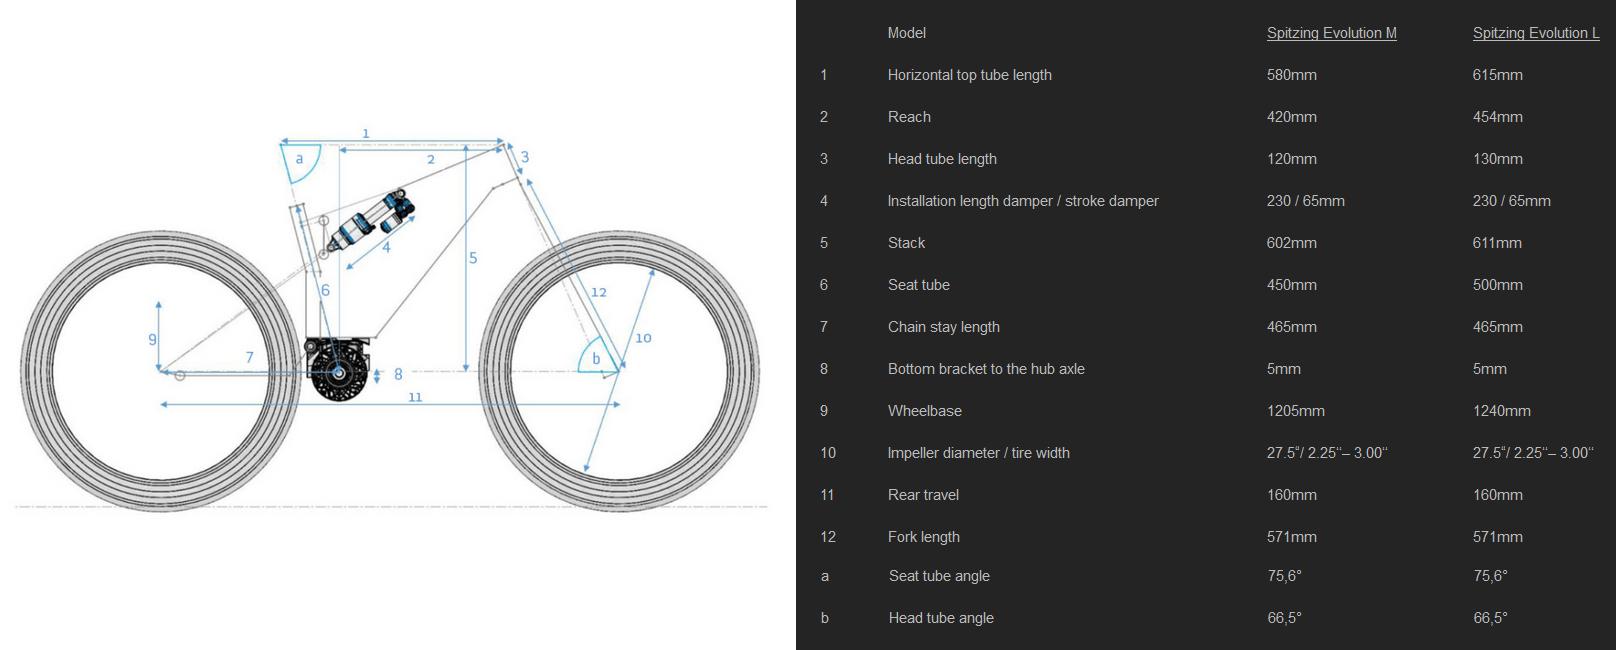 Geometría M1 Spitzing Evolution